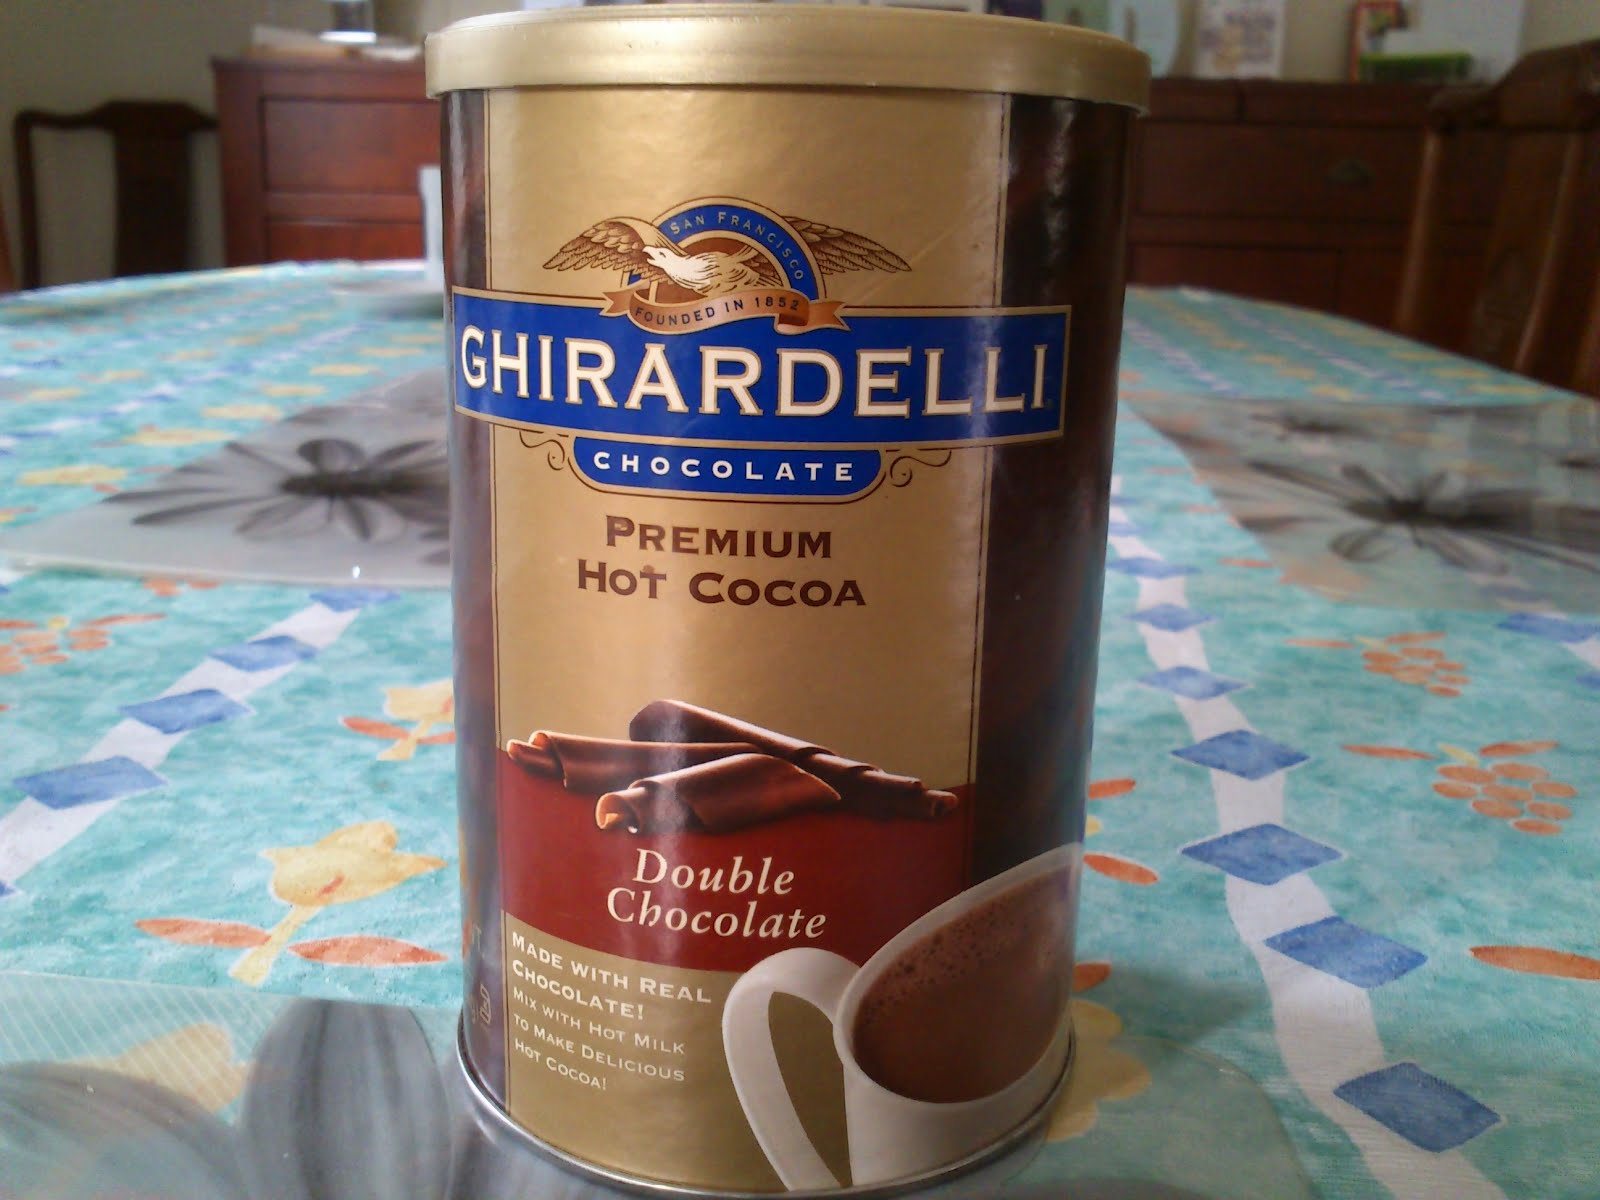 My Hot Cocoa: Ghirardelli Premium Hot Cocoa Double Chocolate